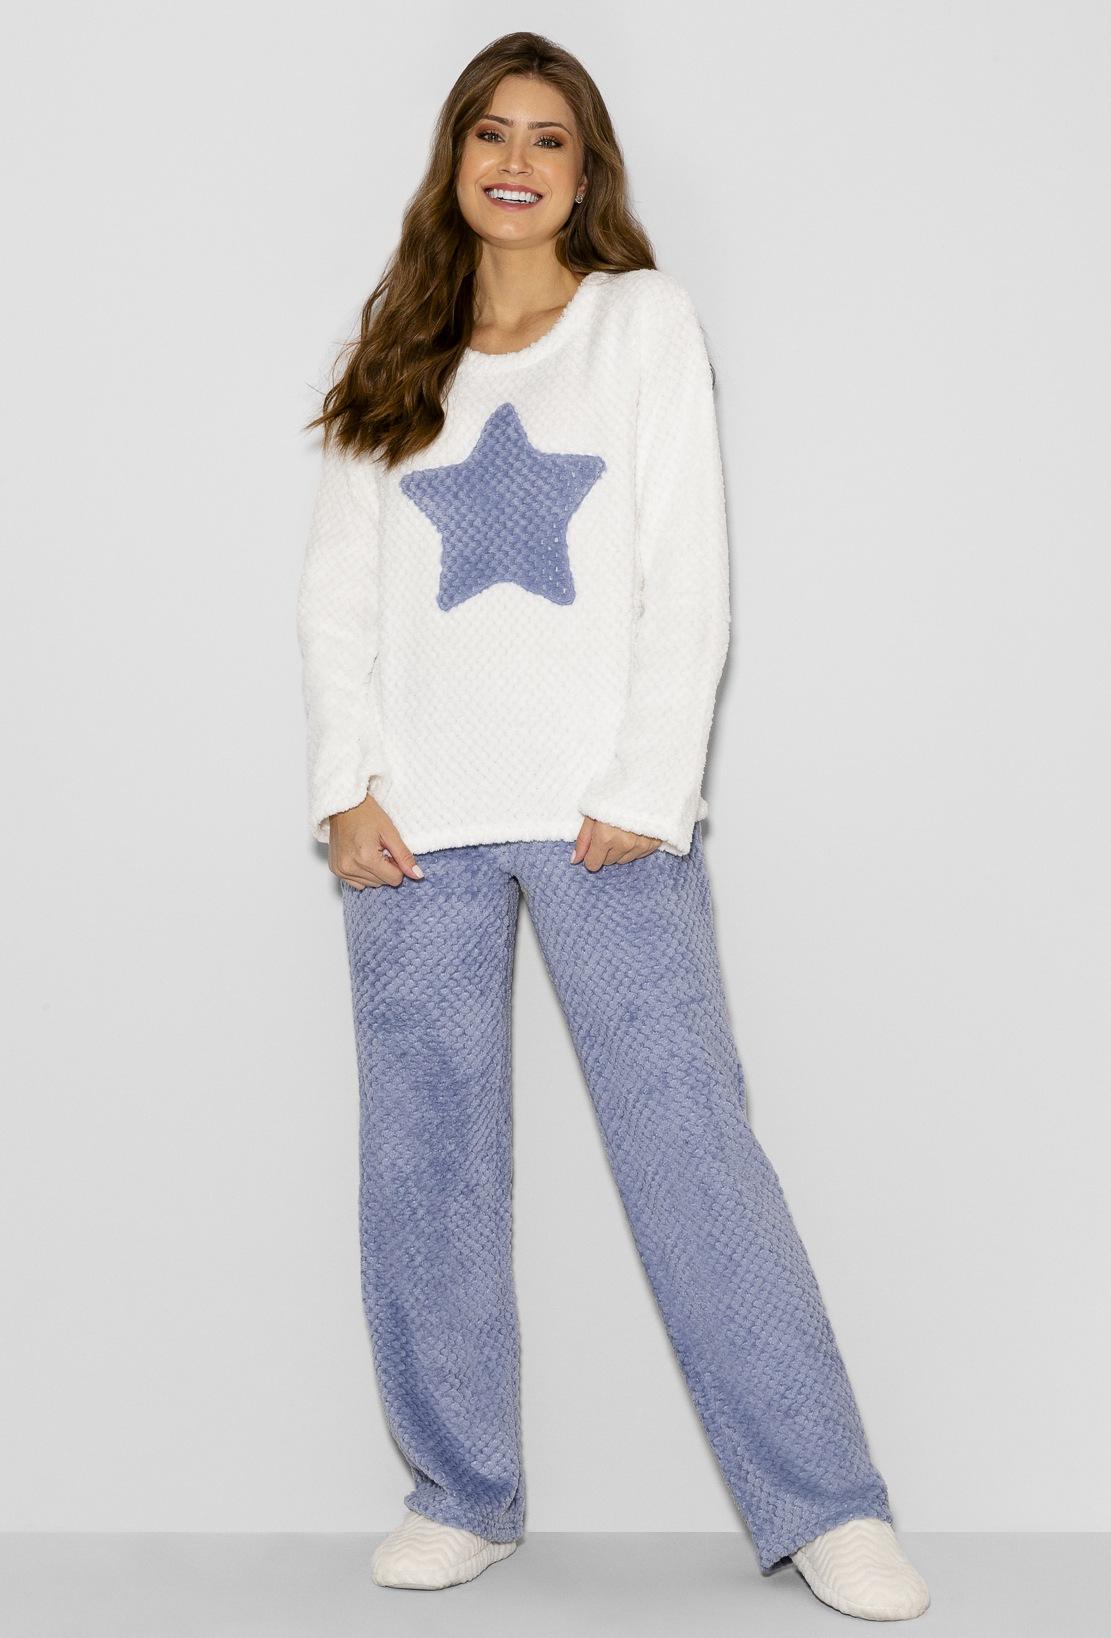 Pijama Manga Longa Soft Feminino Star Any Any